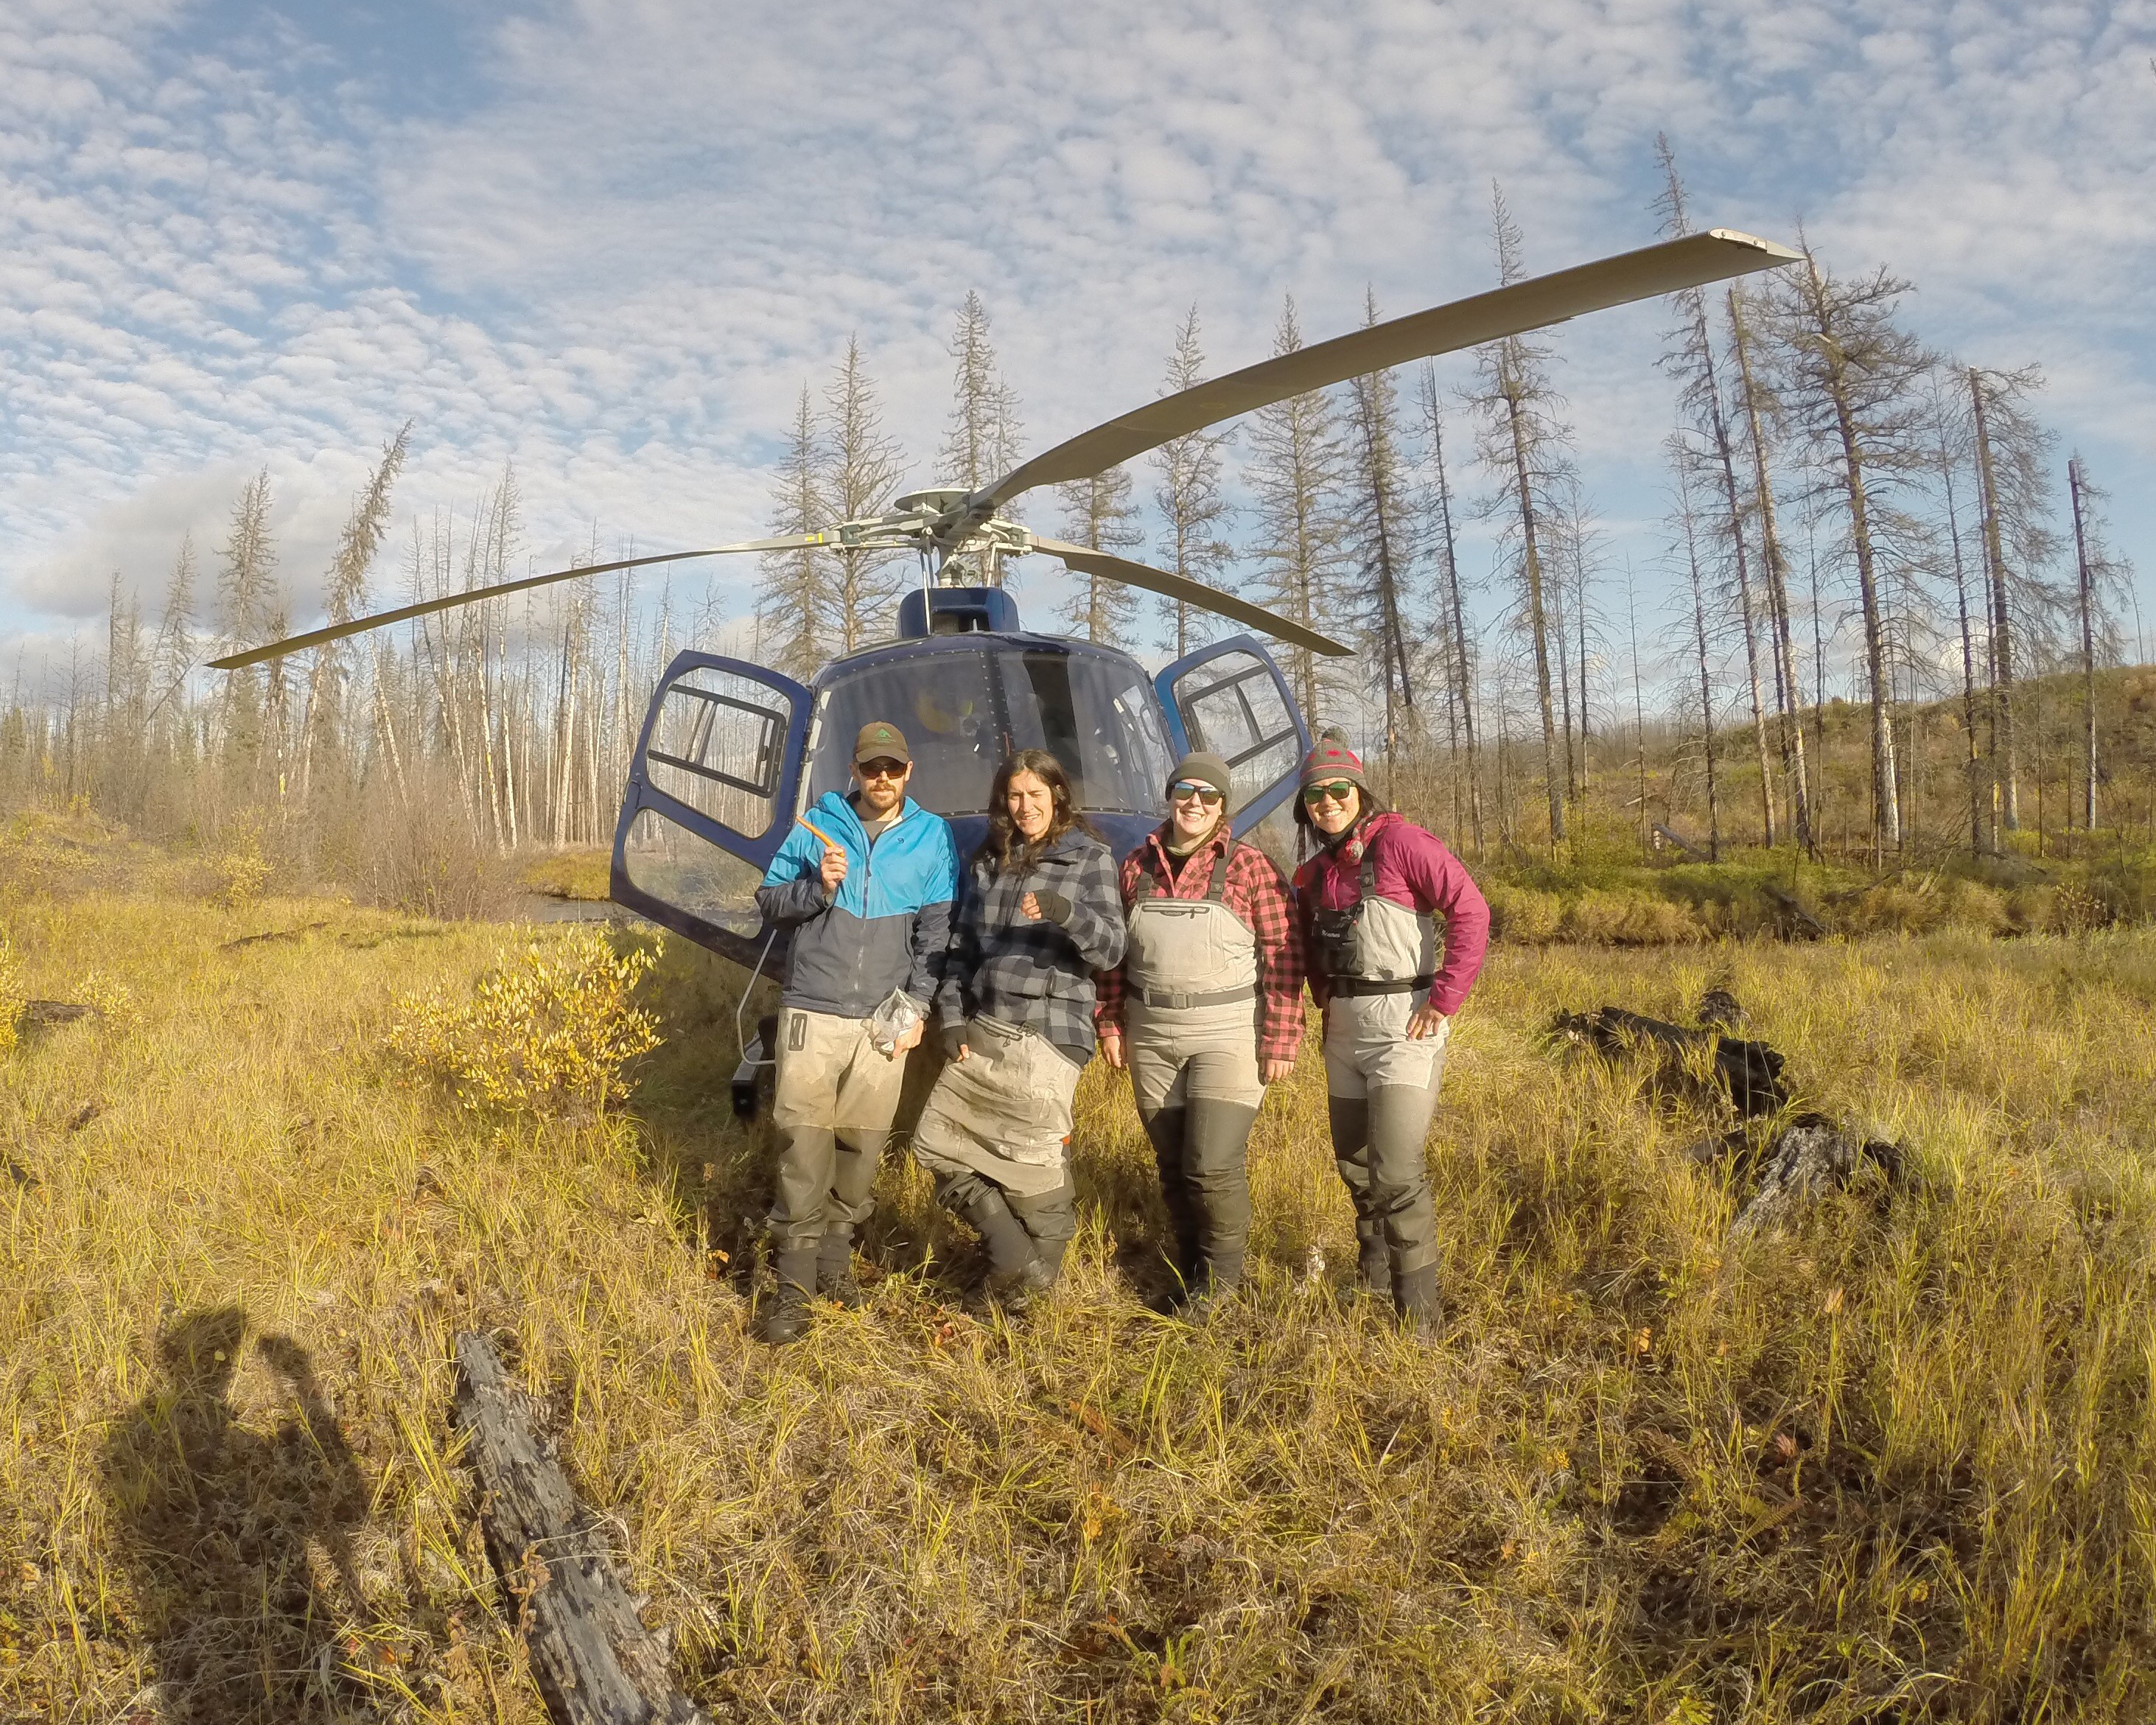 Nicole Cheng: Wood Buffalo National Park